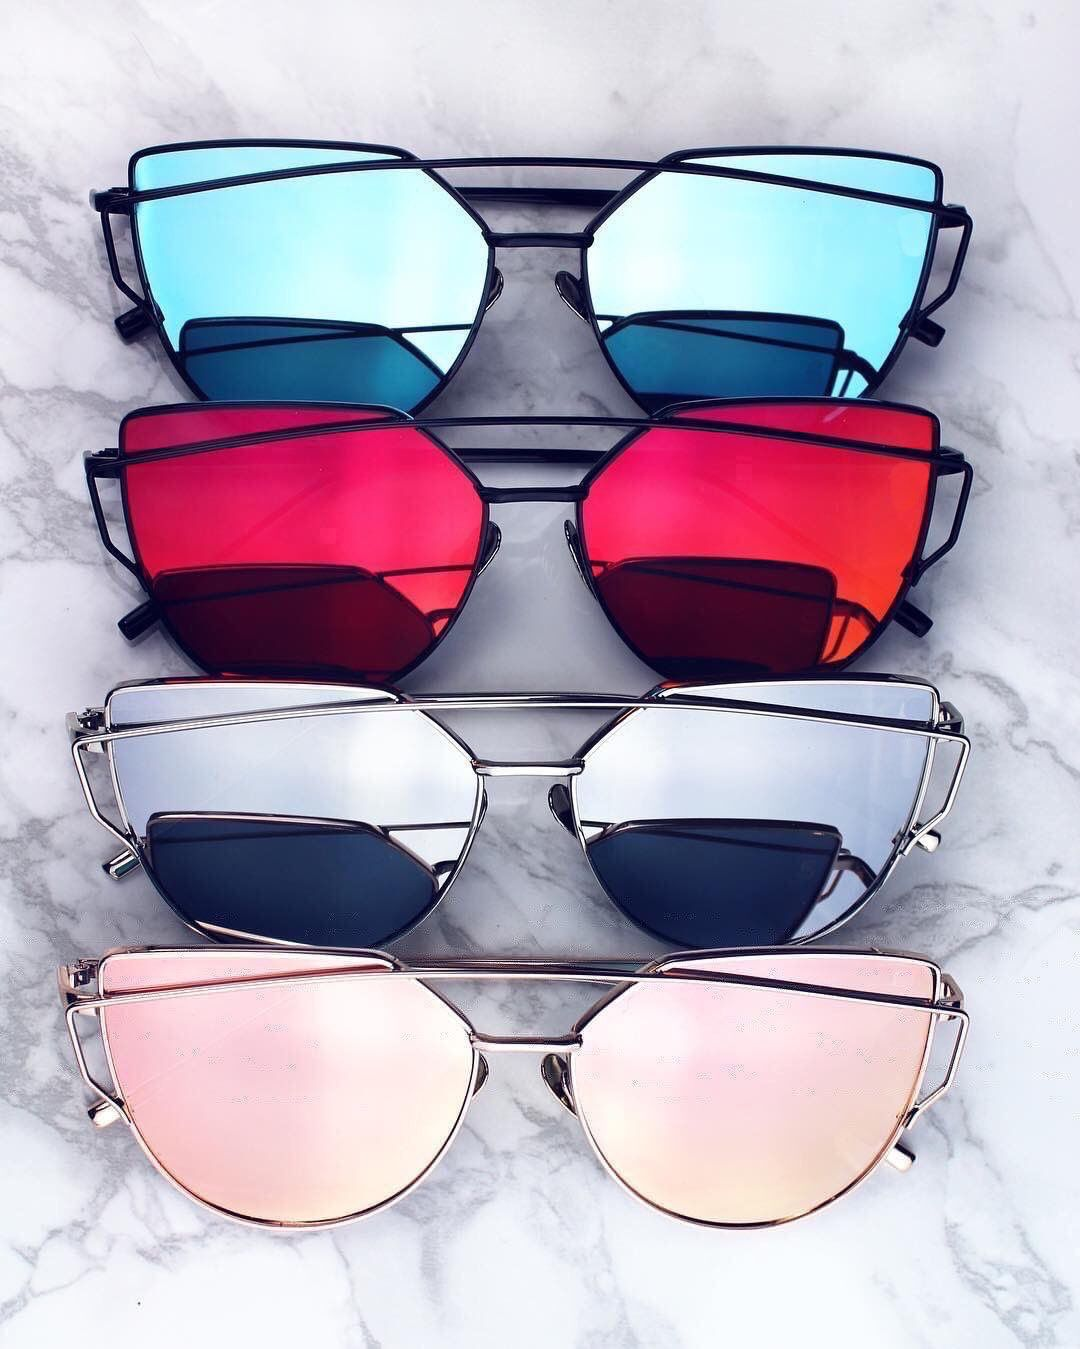 44820284 Pin de 🌻Princess Fall en Things to purchase   Stylish sunglasses,  Sunglasses y Eyeglasses